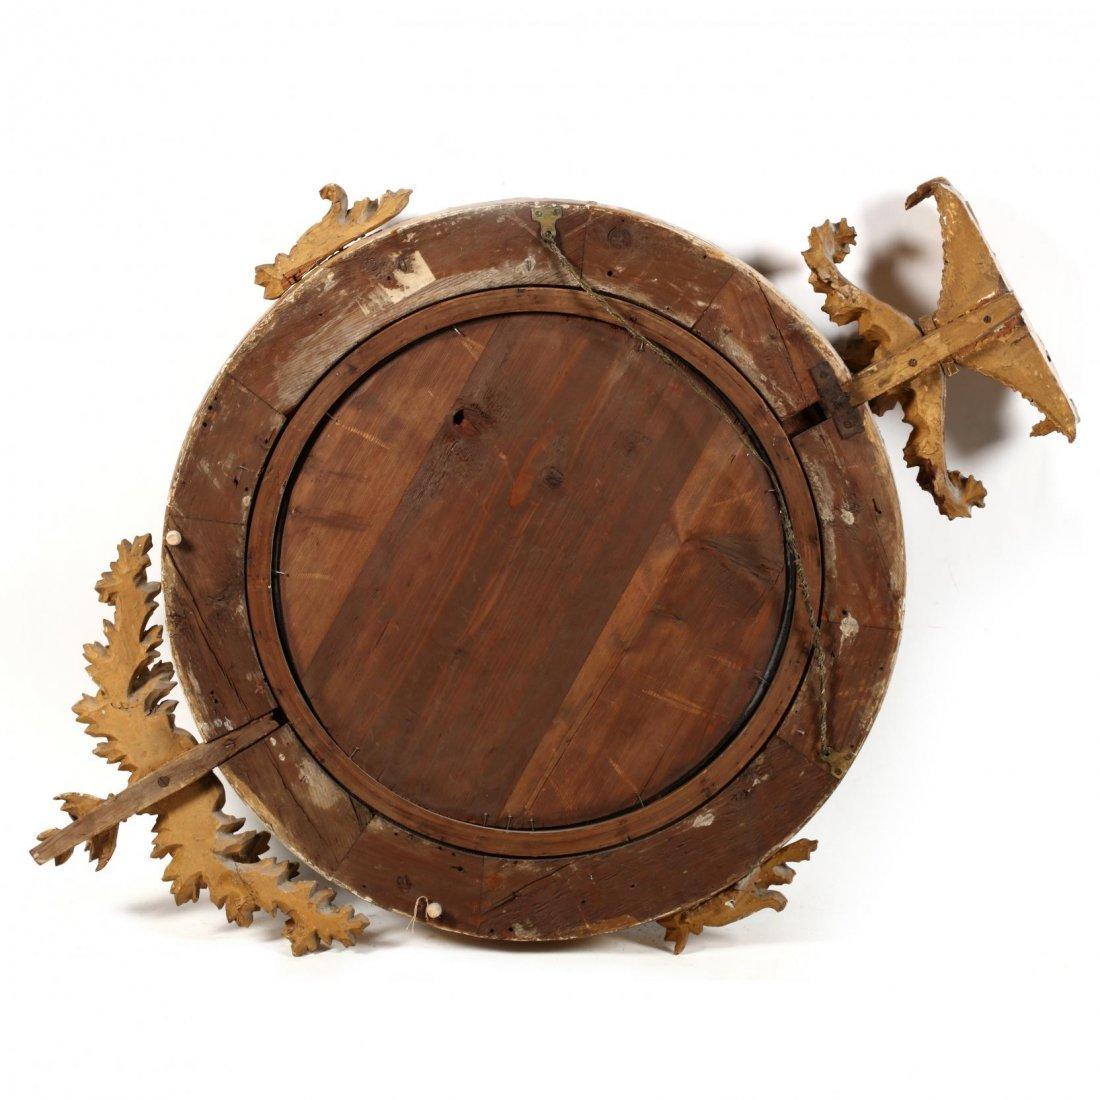 A Regency Carved and Gilded Bullseye Mirror - 4